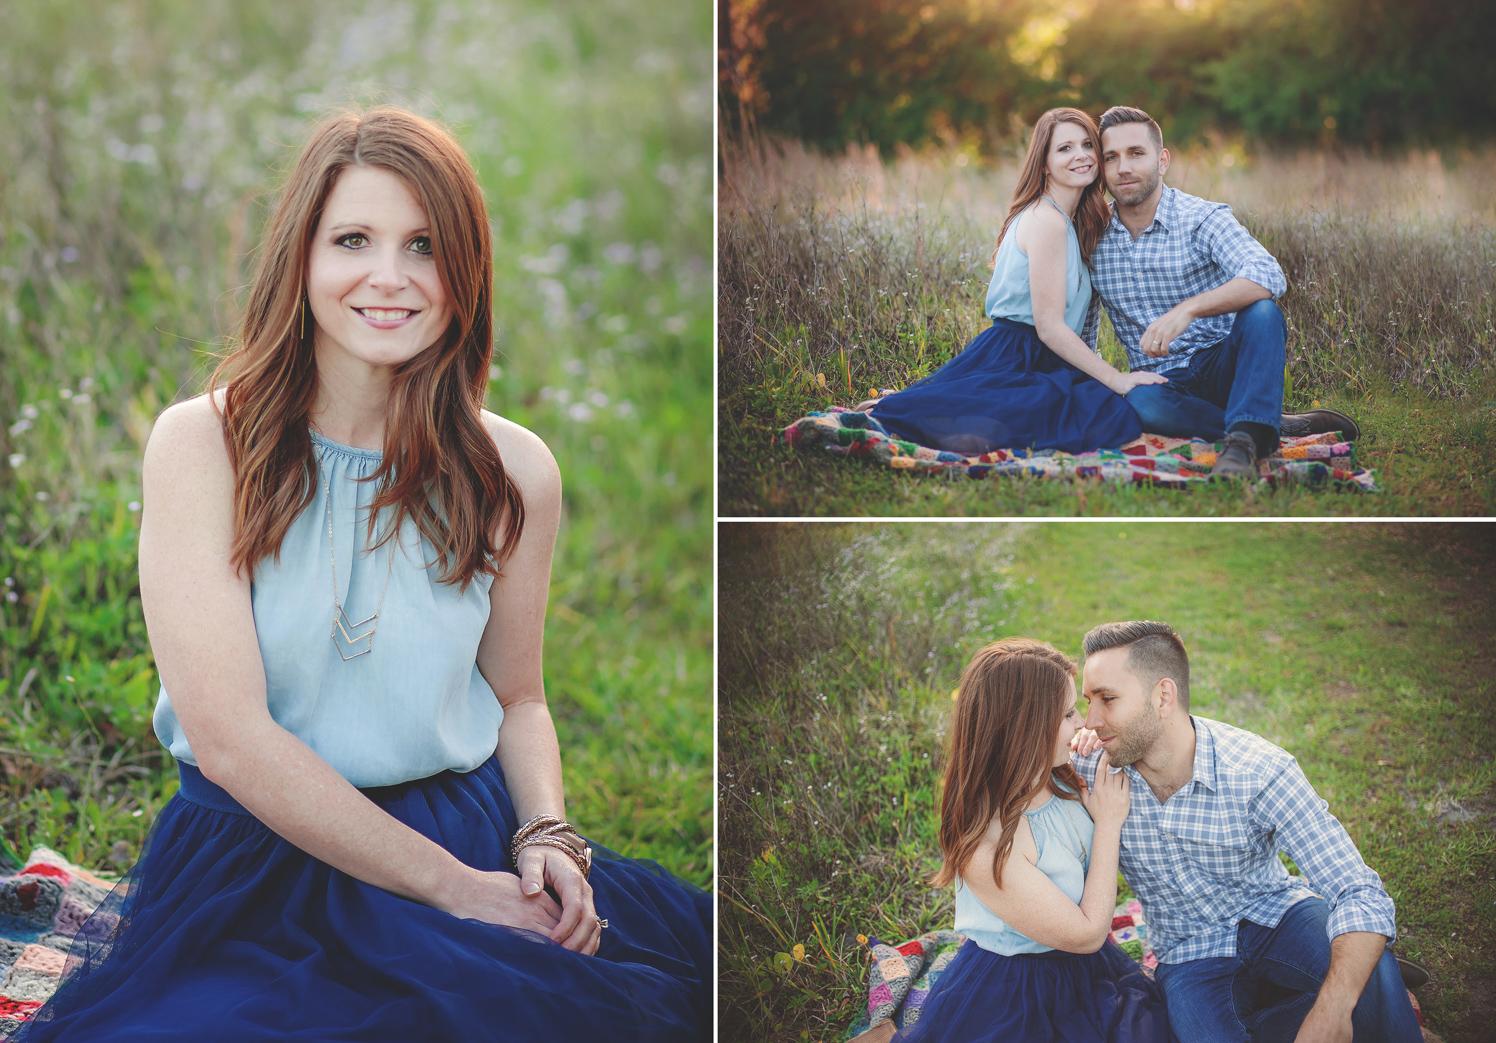 adam-szarmack-family-portraits-photography-love-2.jpg